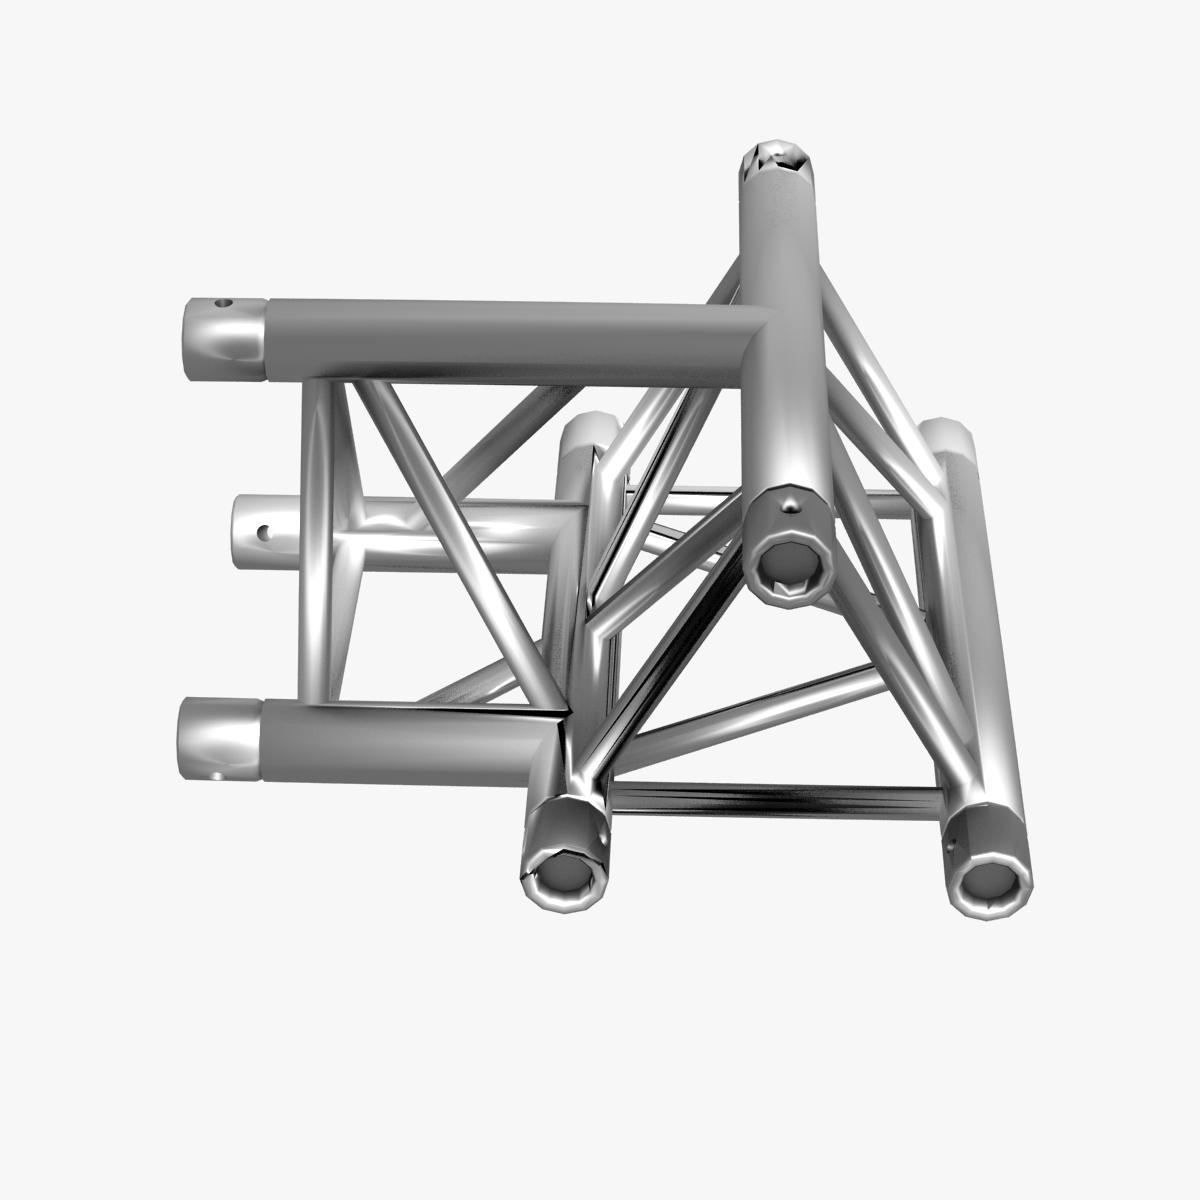 triangular trusses (collection 55 modular pieces) 3d model 3ds max dxf fbx c4d dae texture obj 216219